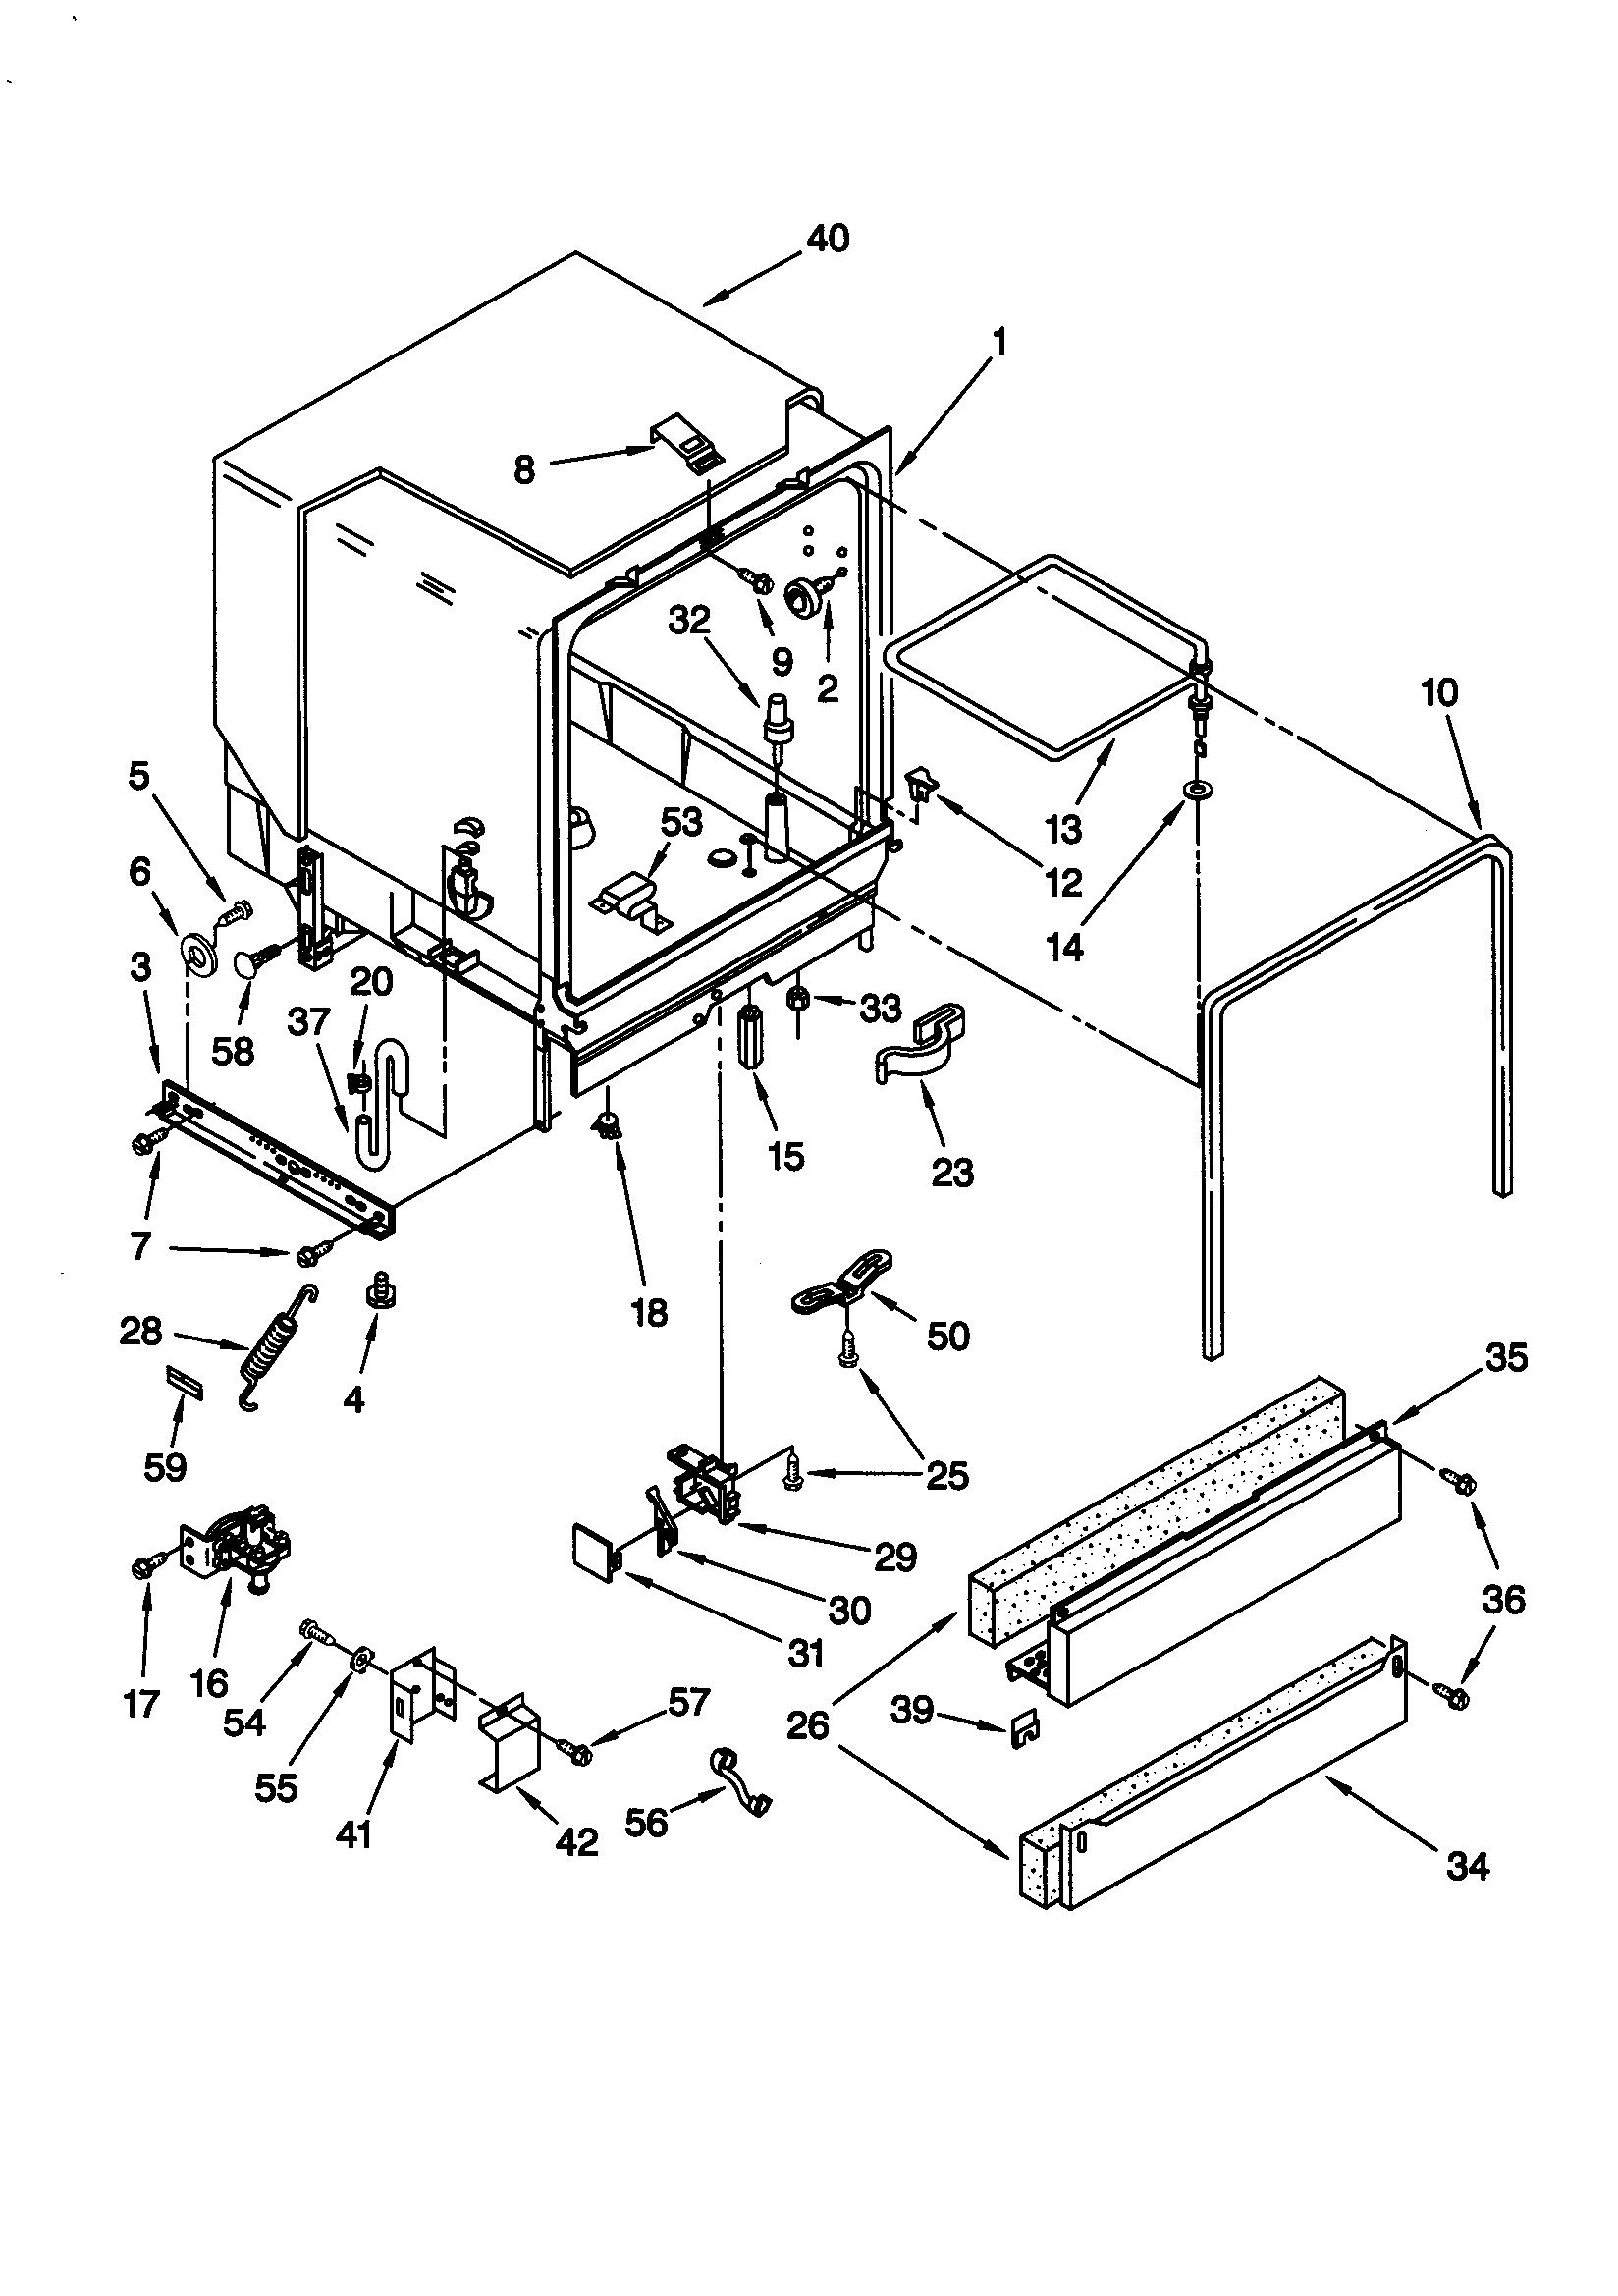 Whirlpool model GU940SCGB2 dishwasher genuine parts